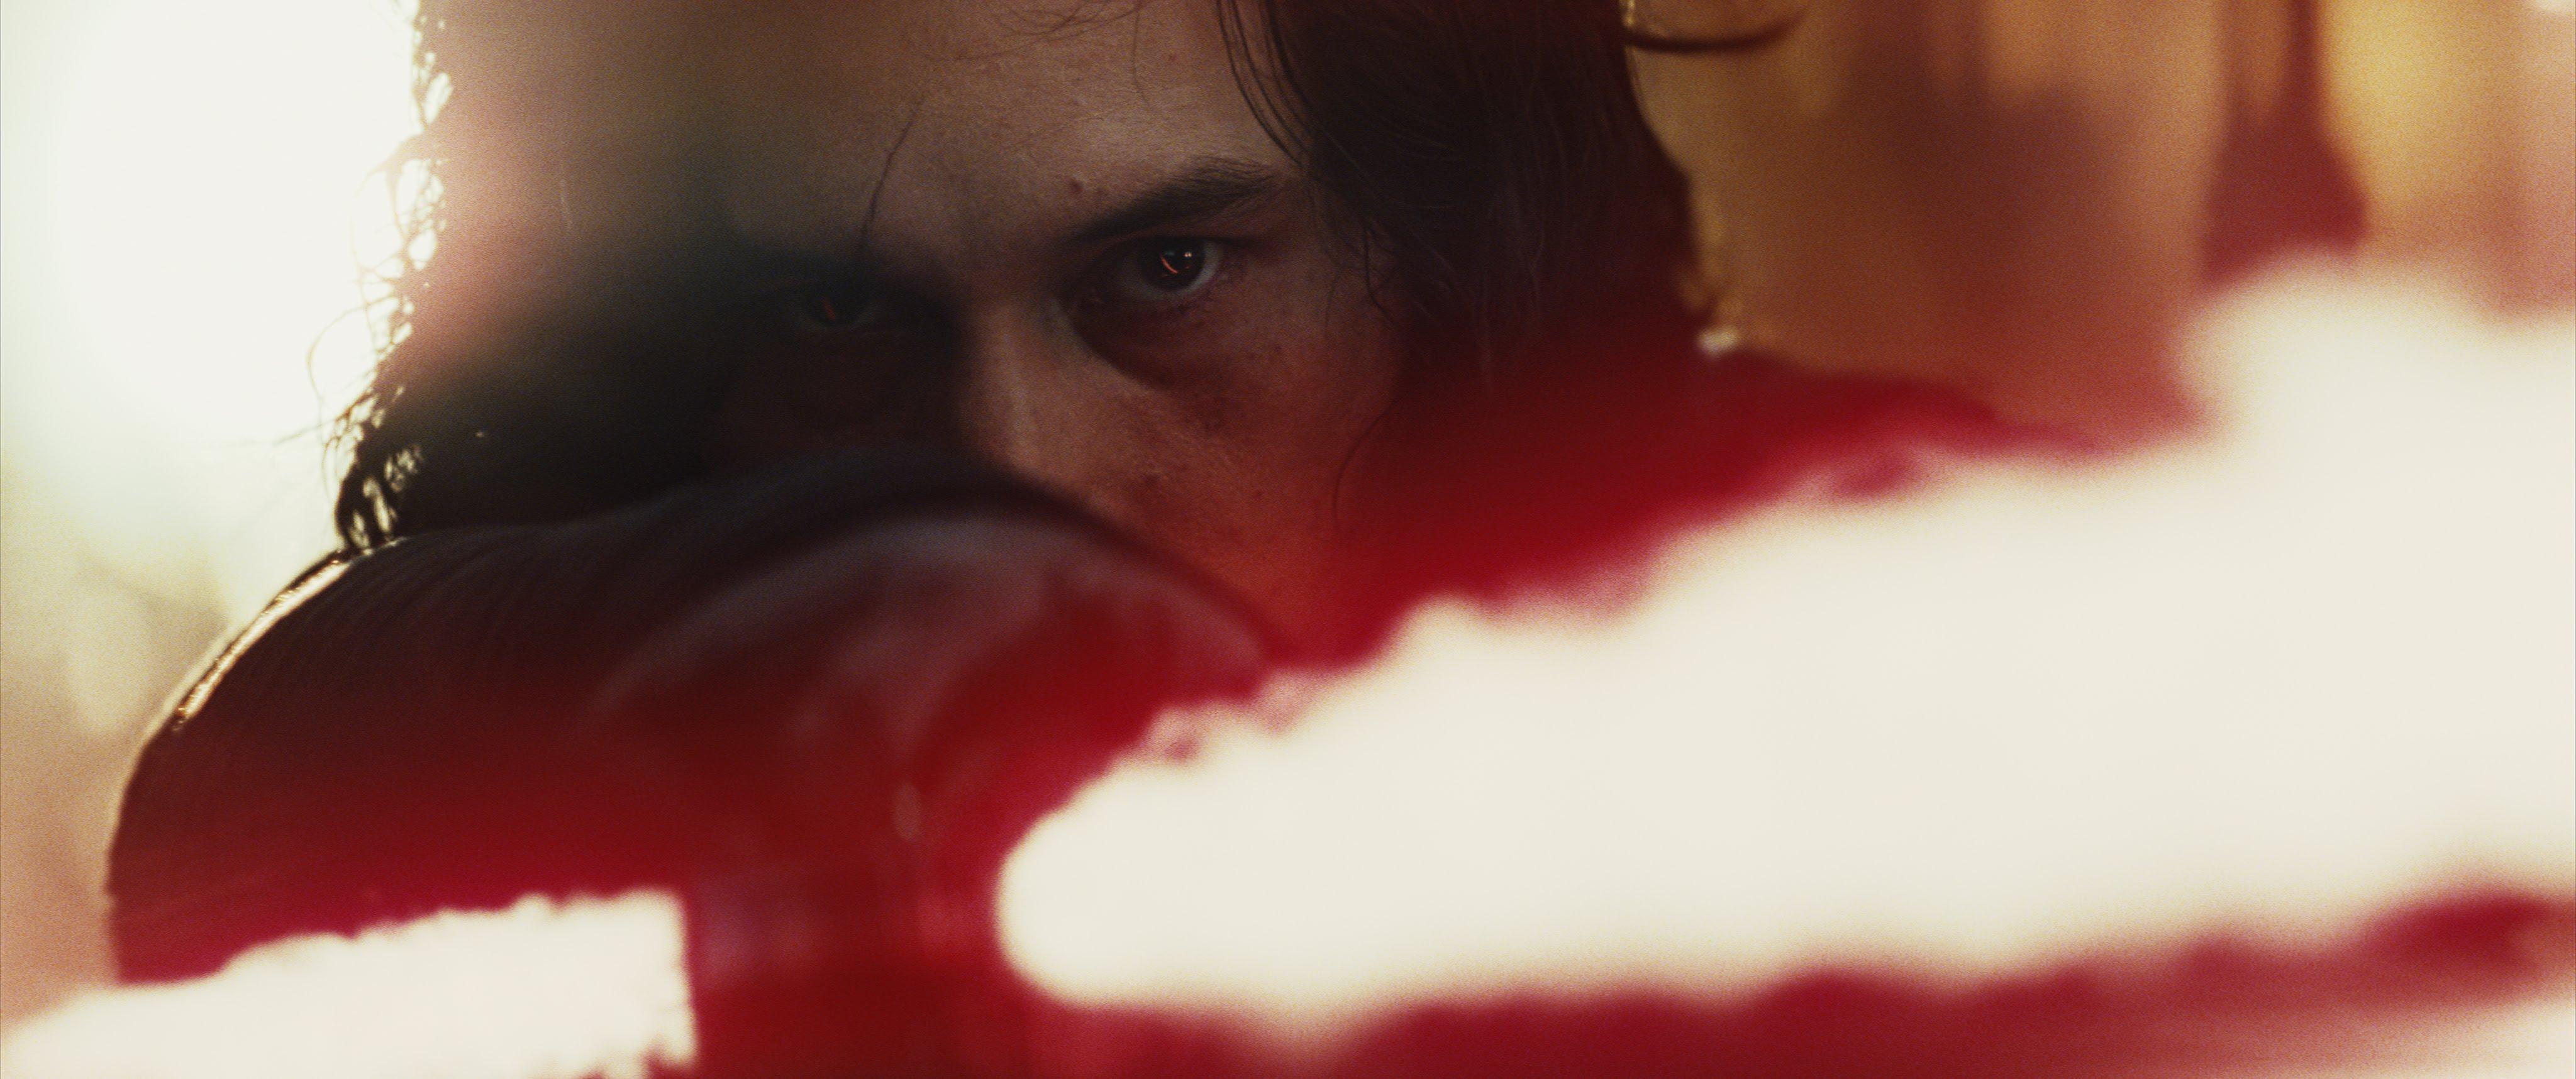 Star Wars Kylo Ren Tribute Video with Watchmen Music Never Surrender : TVシリーズ「ウォッチメン」のテーマ曲をフィーチャーして、「スター・ウォーズ」の暗黒の騎士にトリビュートしたクールなビデオ「ネヴァー・サレンダー」 ! !